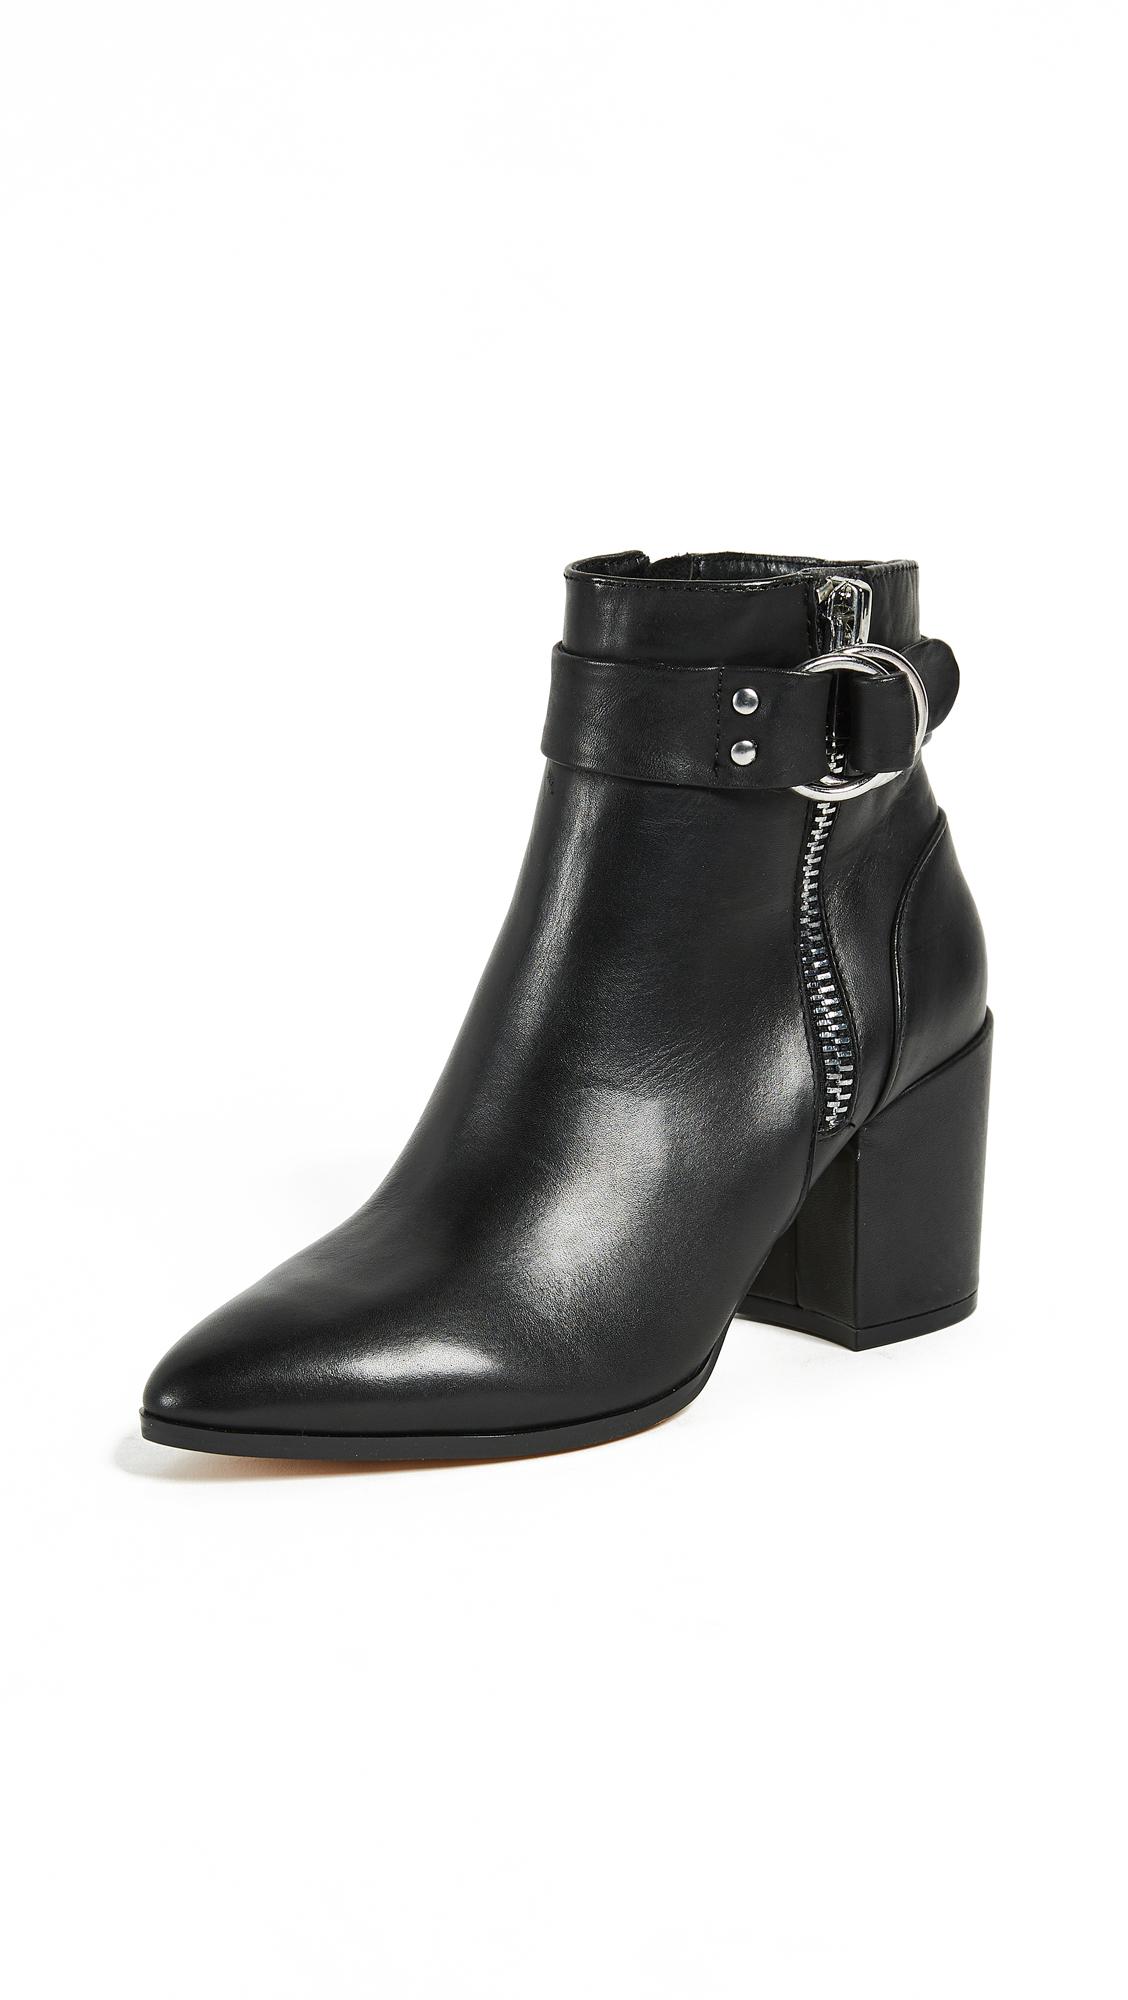 Steven Johanna Block Heel Ankle Boots - Black